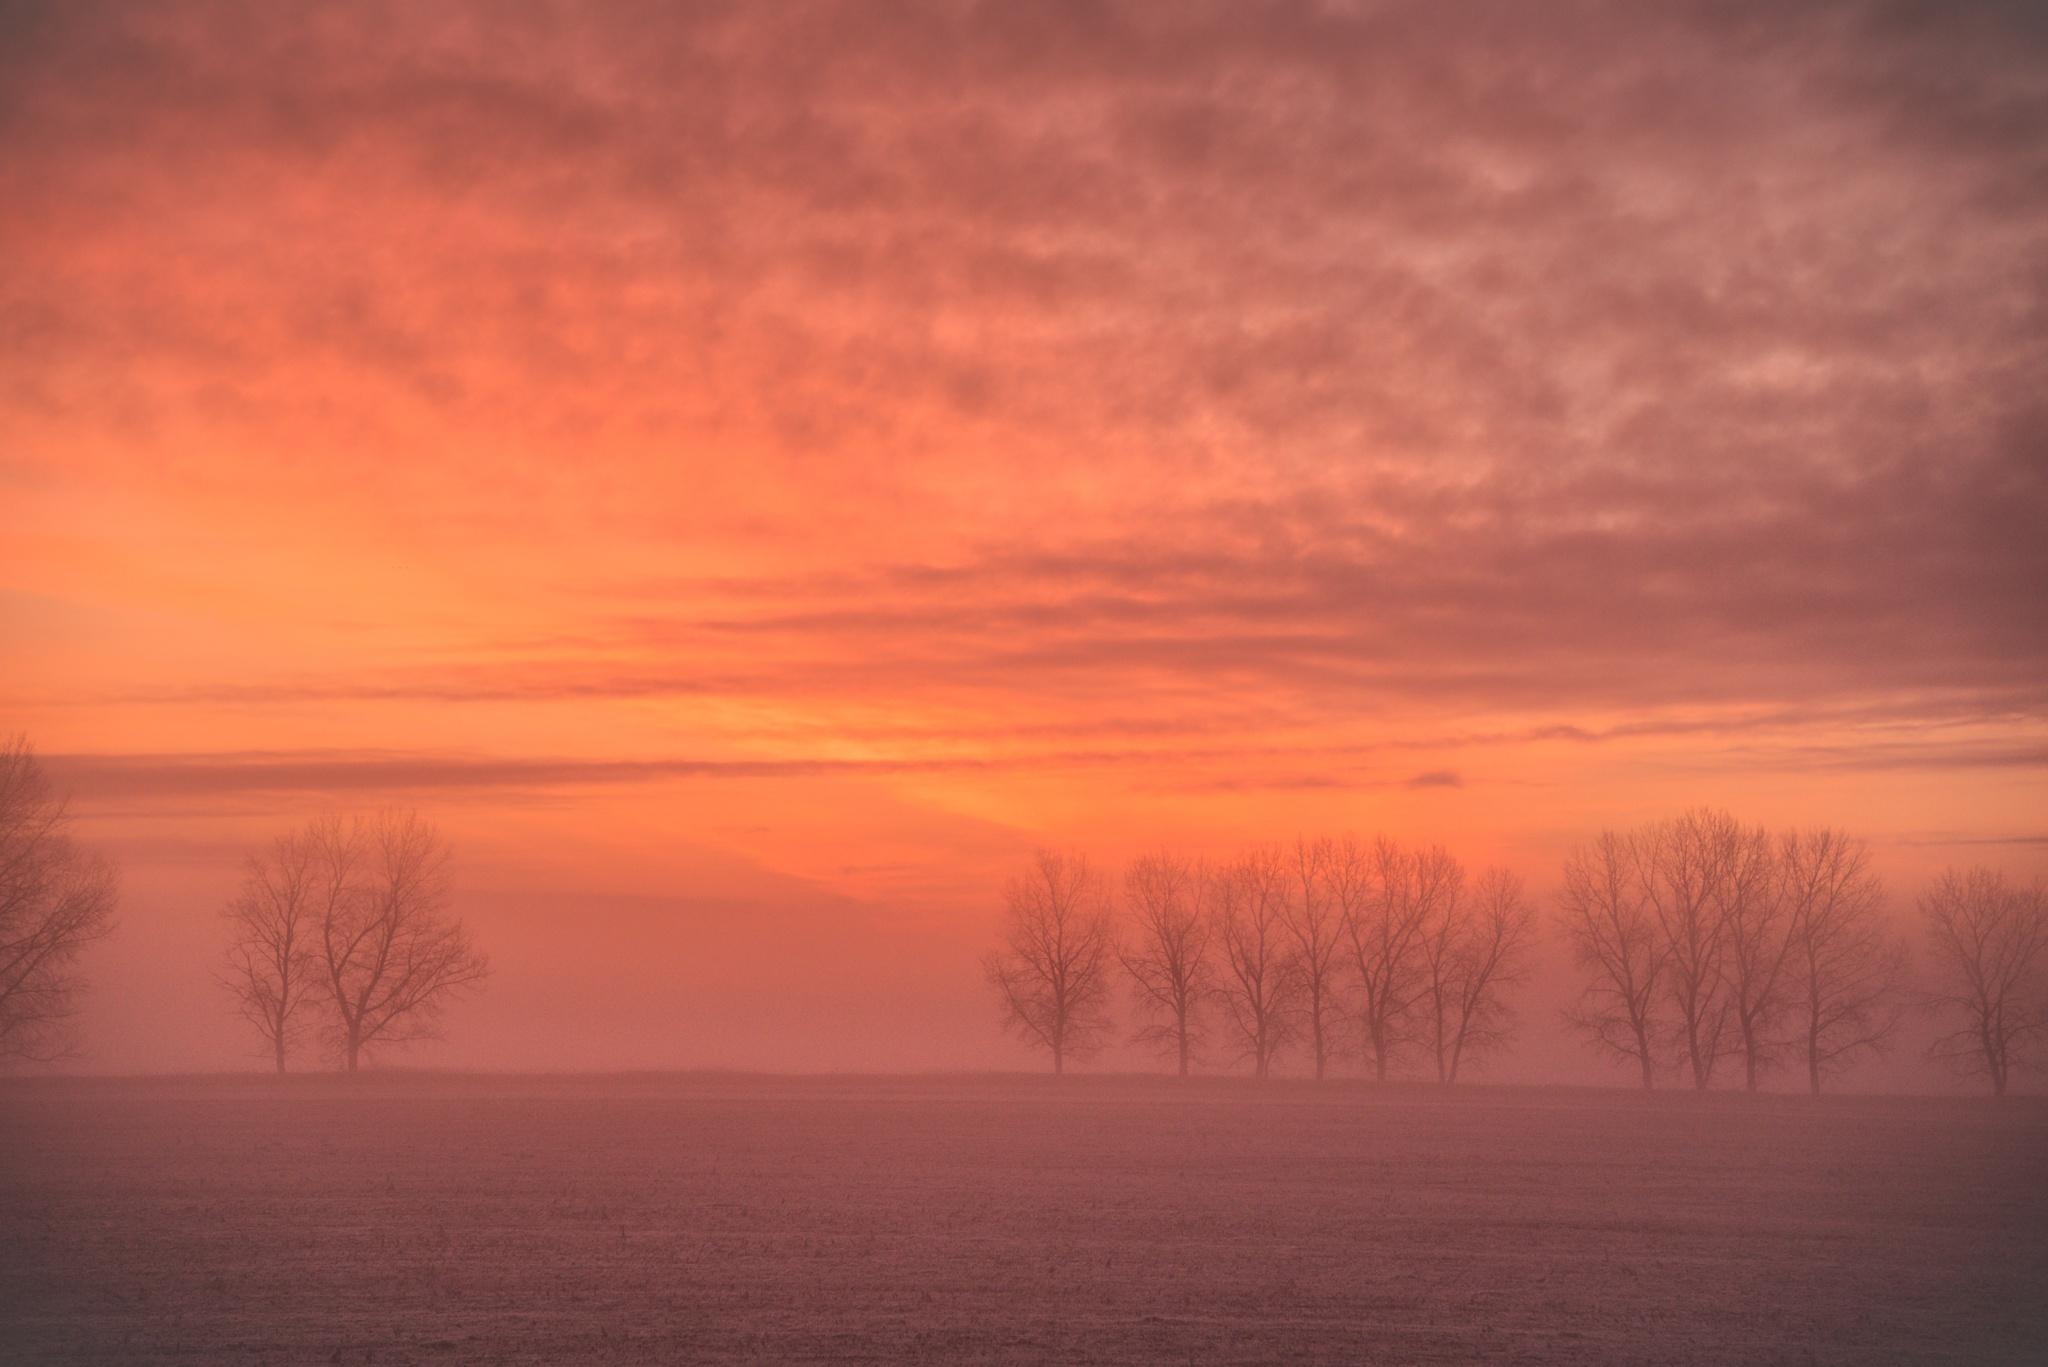 Foggy Sunrise by Brownacres